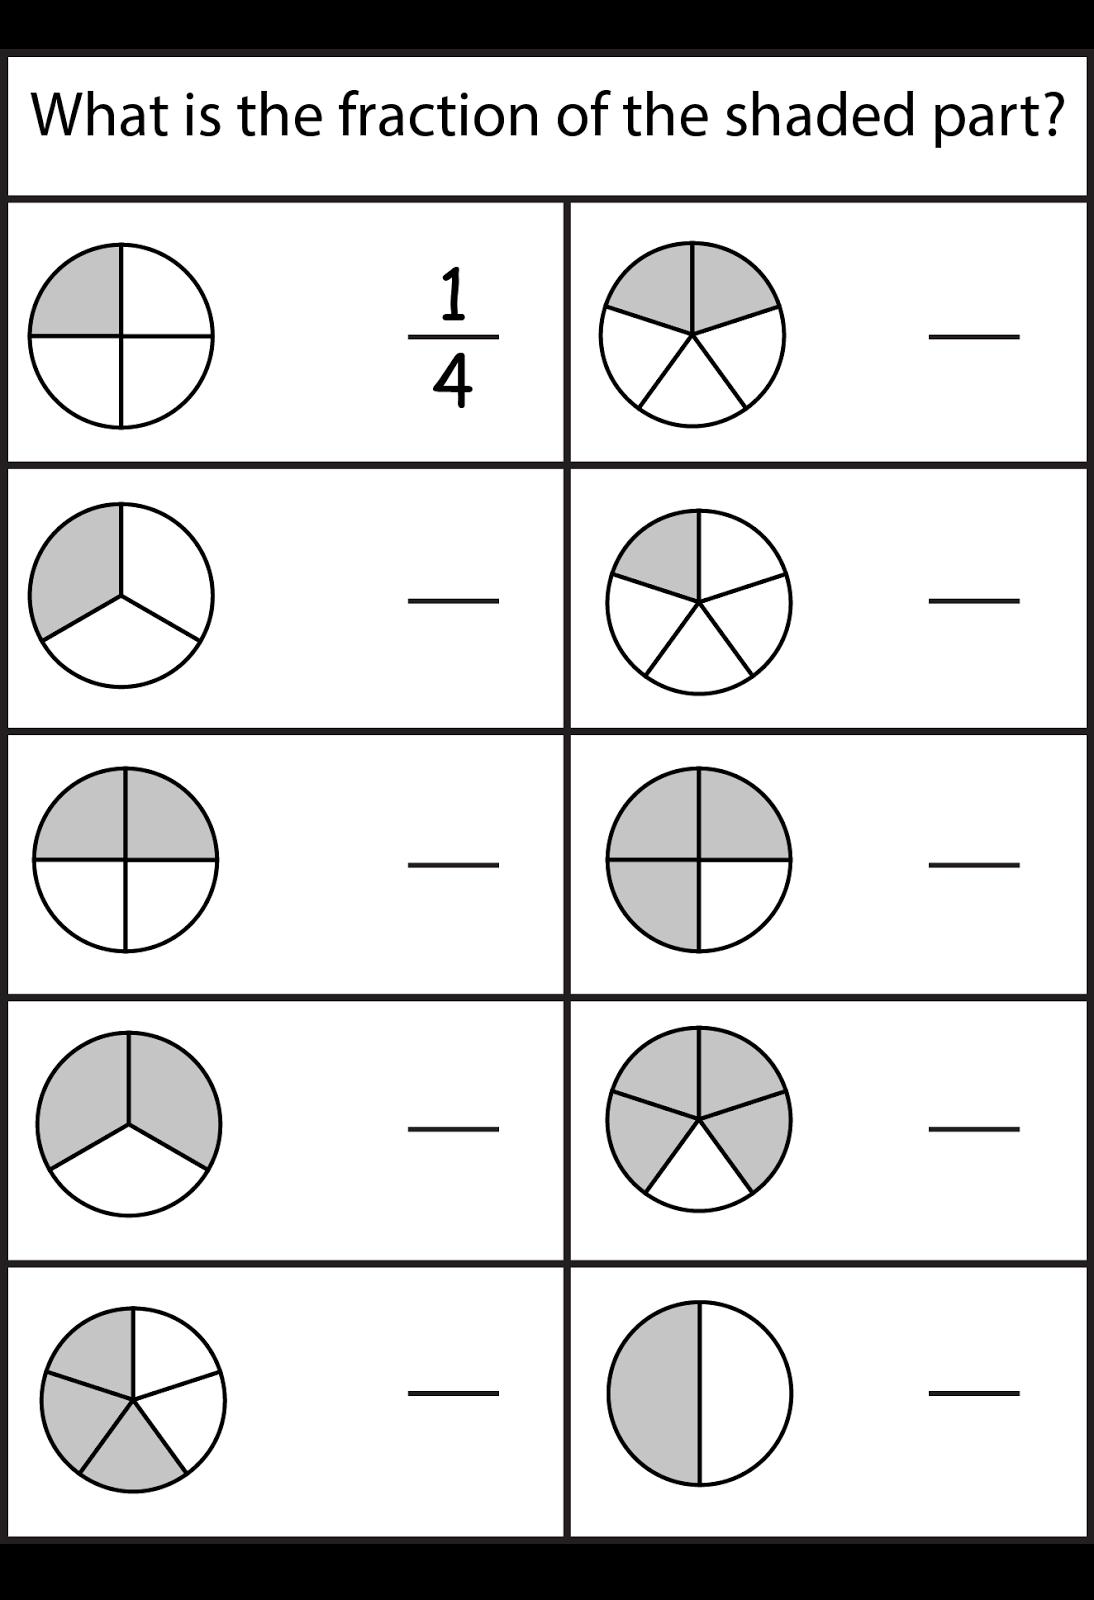 Free Printable Math Worksheets | Ide | Pinterest | Printable maths ...